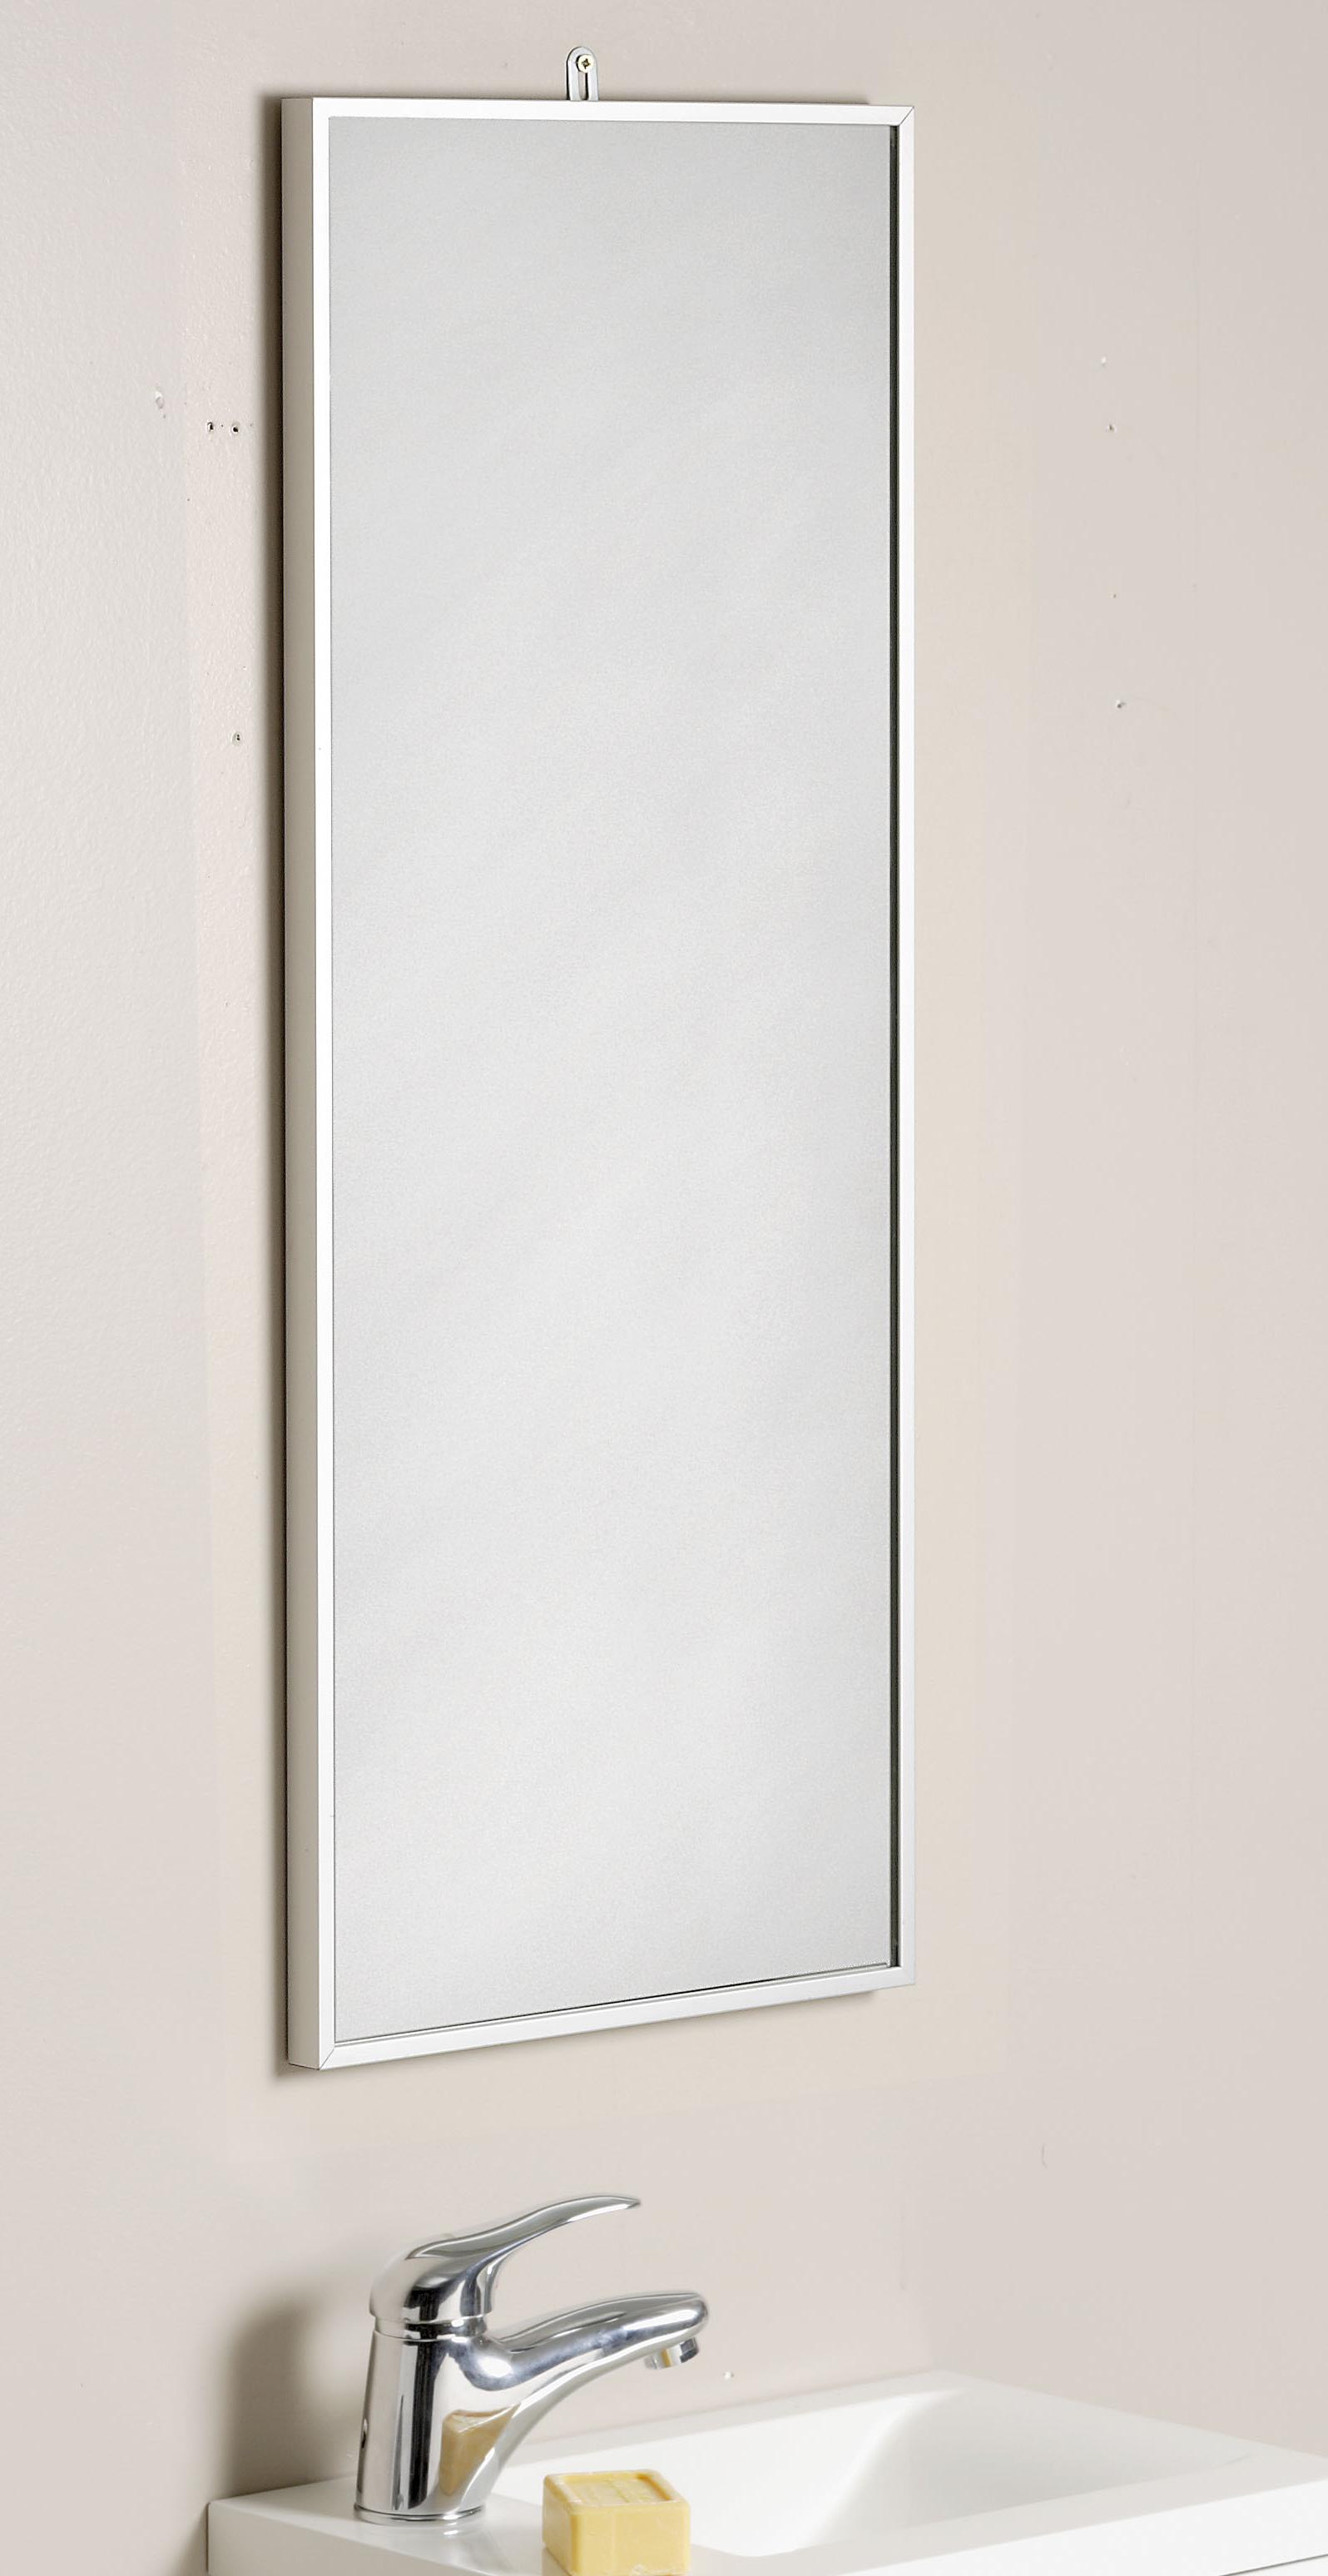 Miroir miroir cap aquarine for Miroir cadre